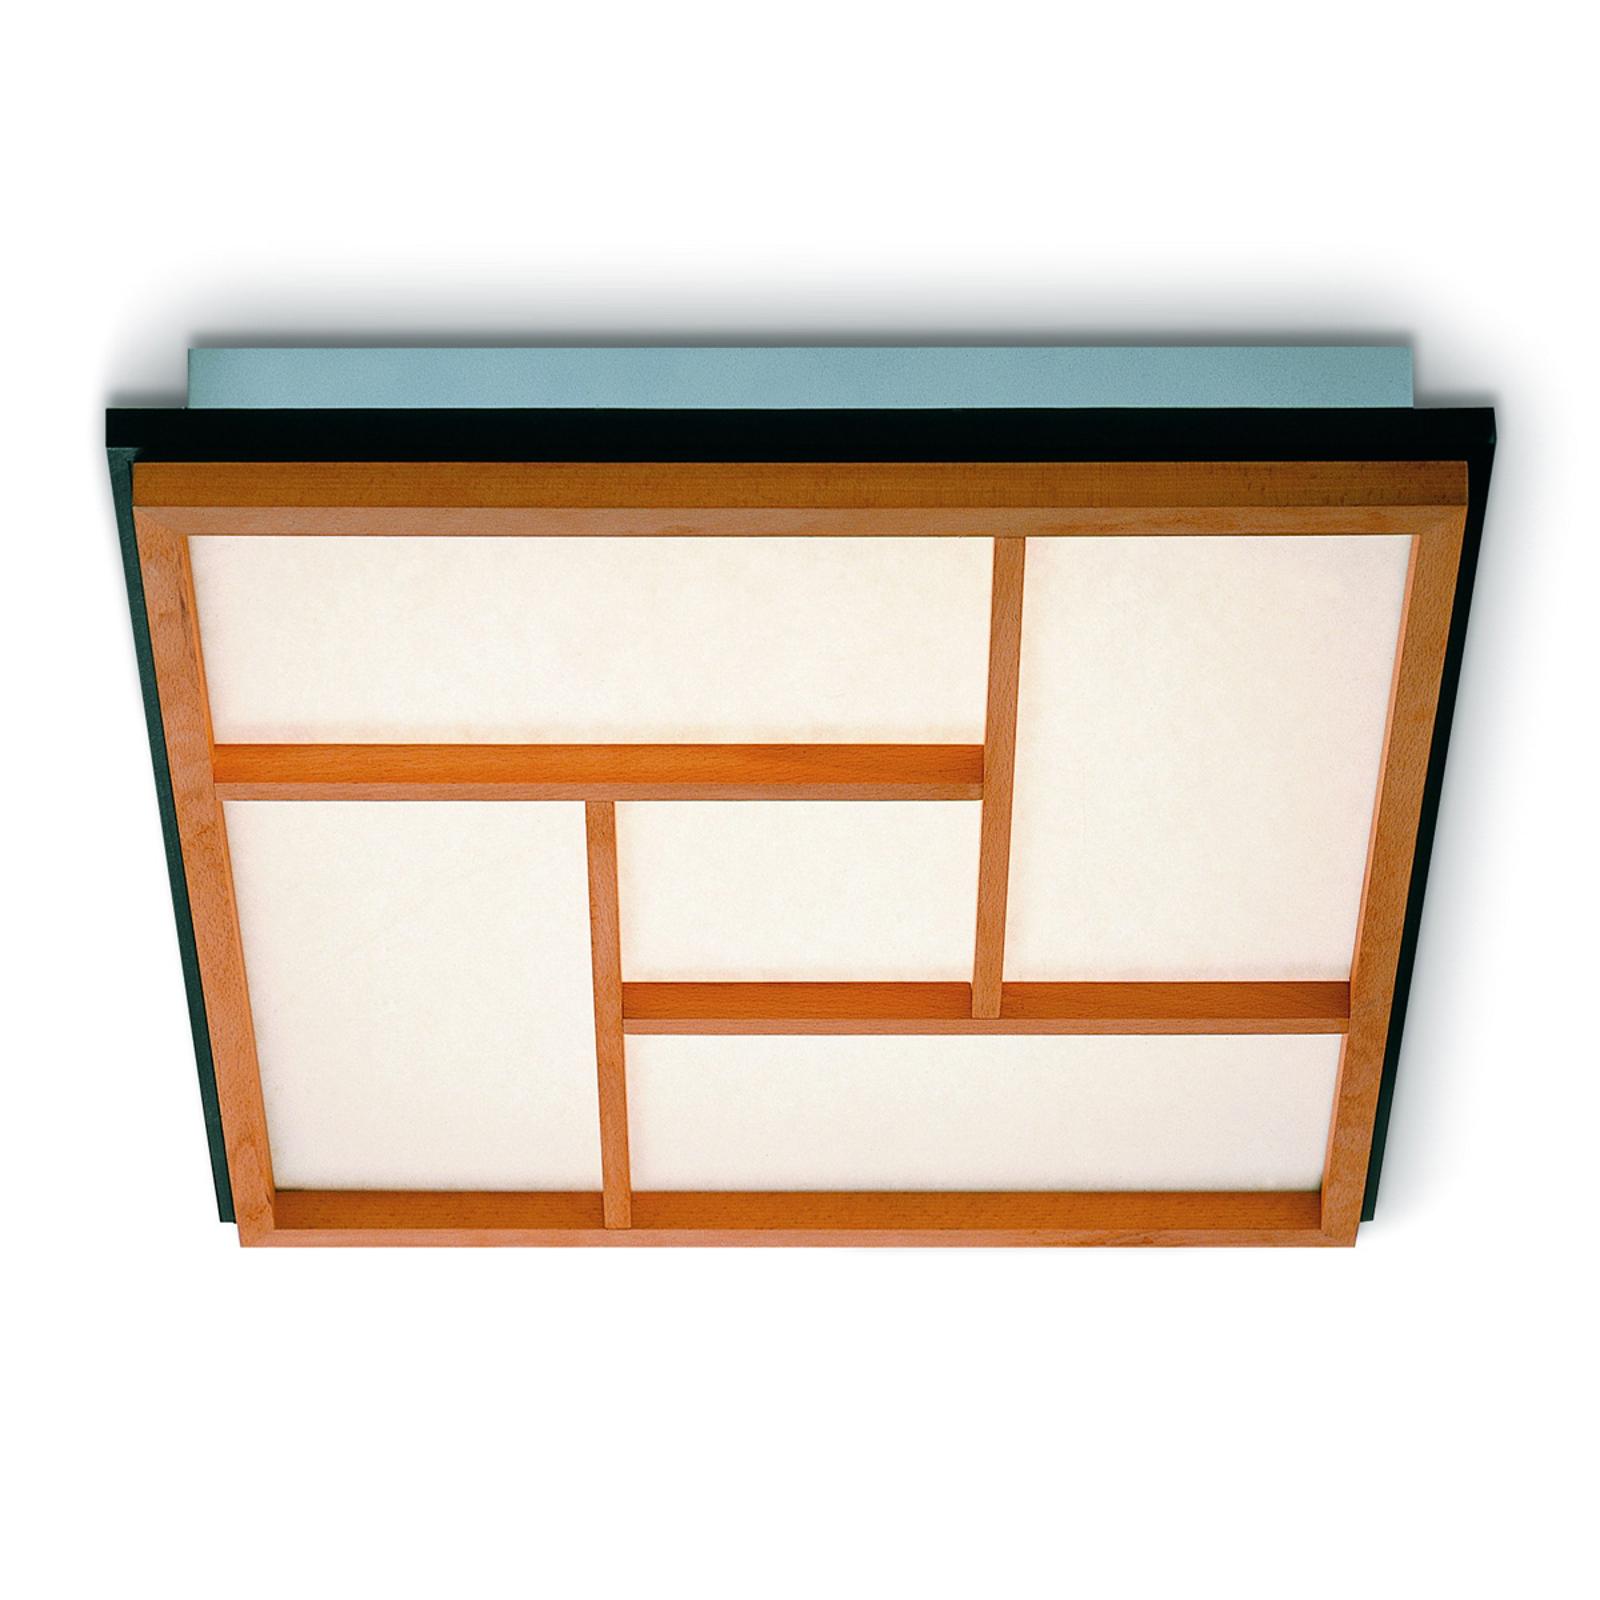 Kioto 5 - LED-Deckenleuchte aus Buchenholz